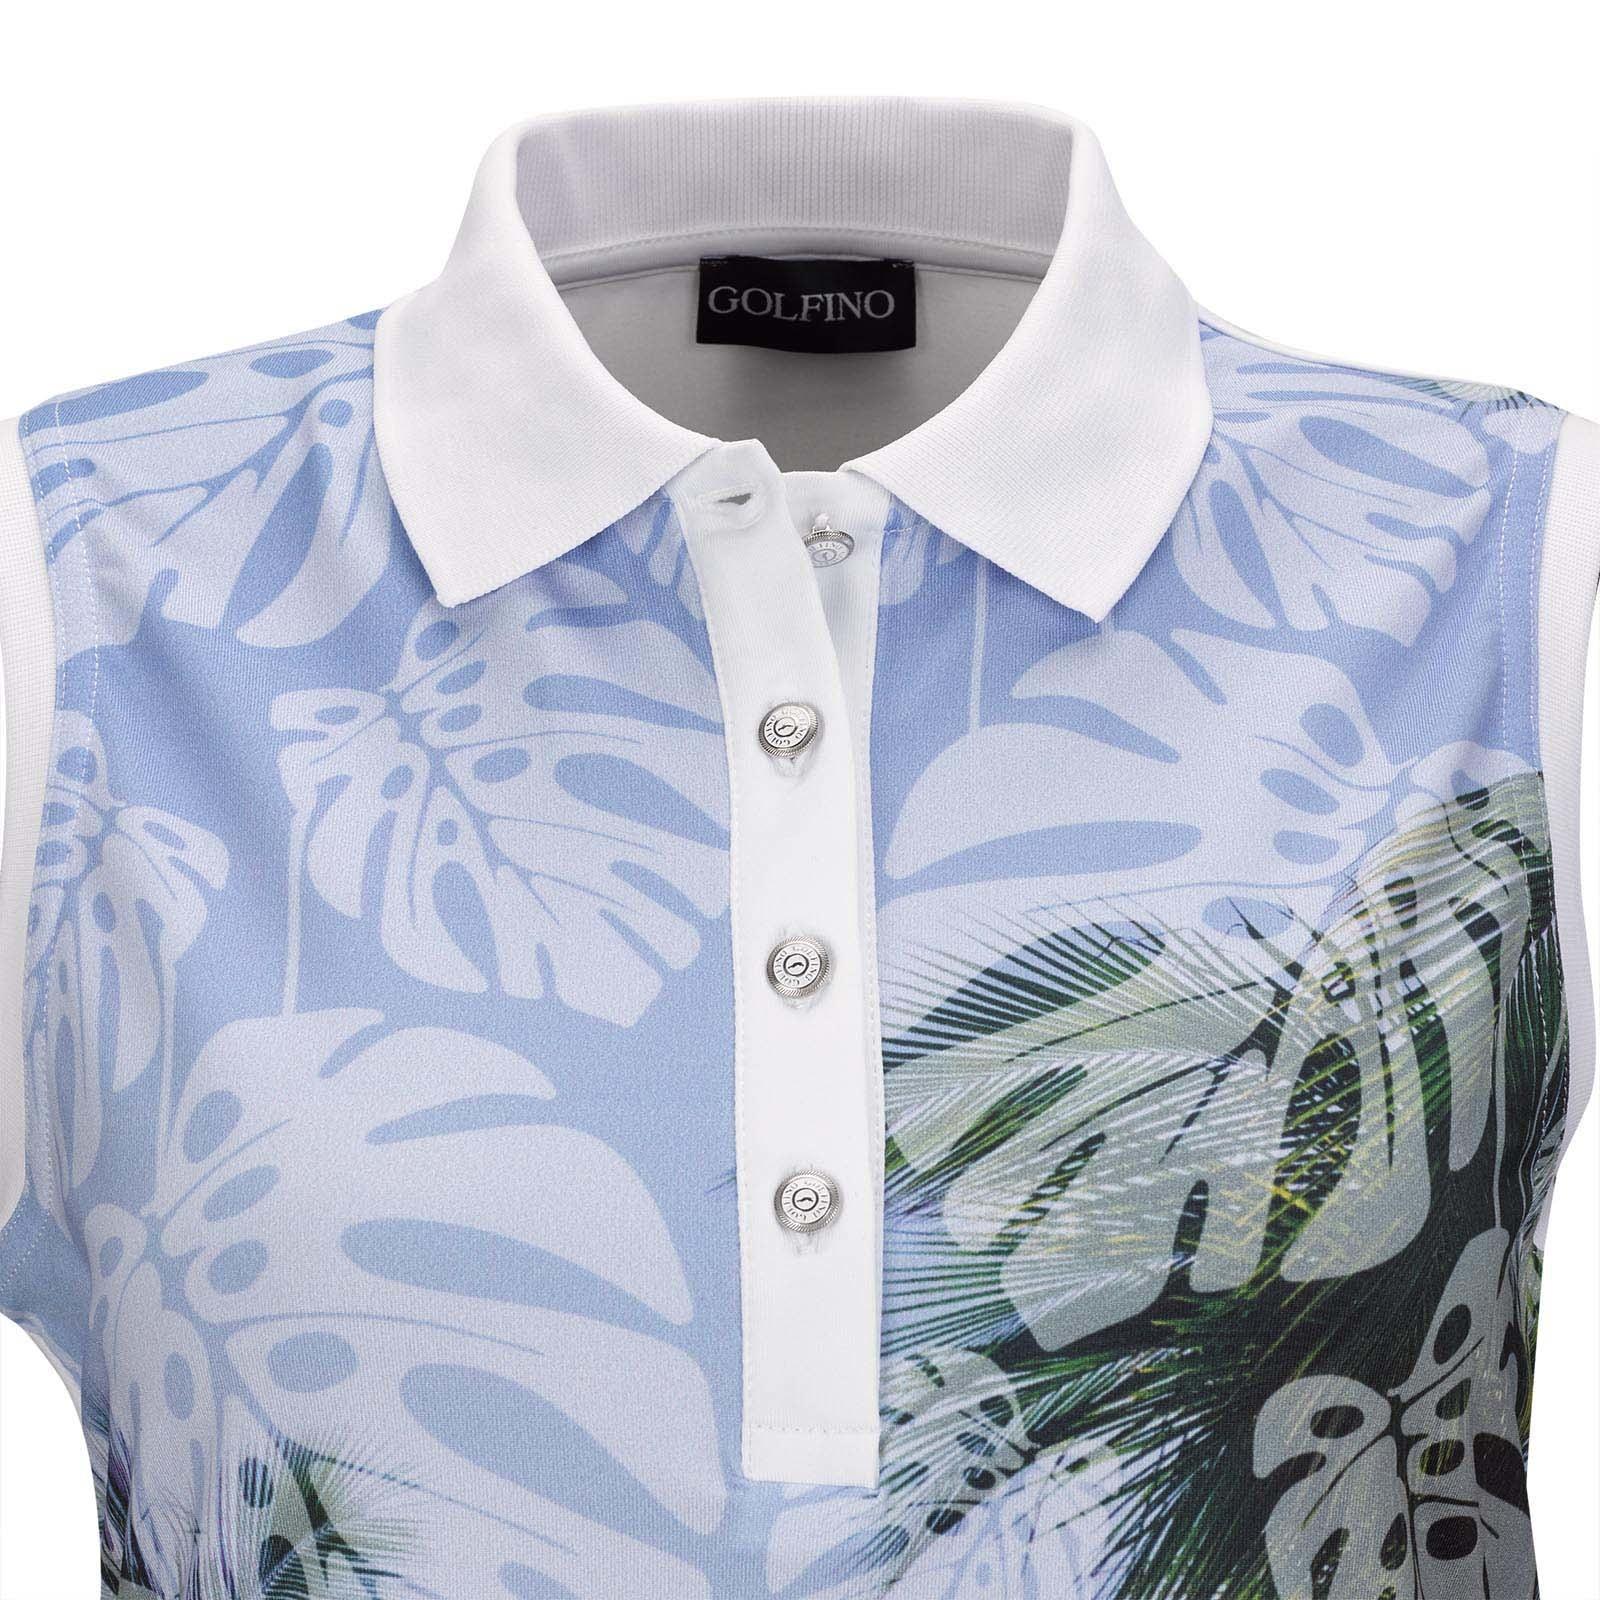 Golfino Golfino Palm Beach SL Polo White